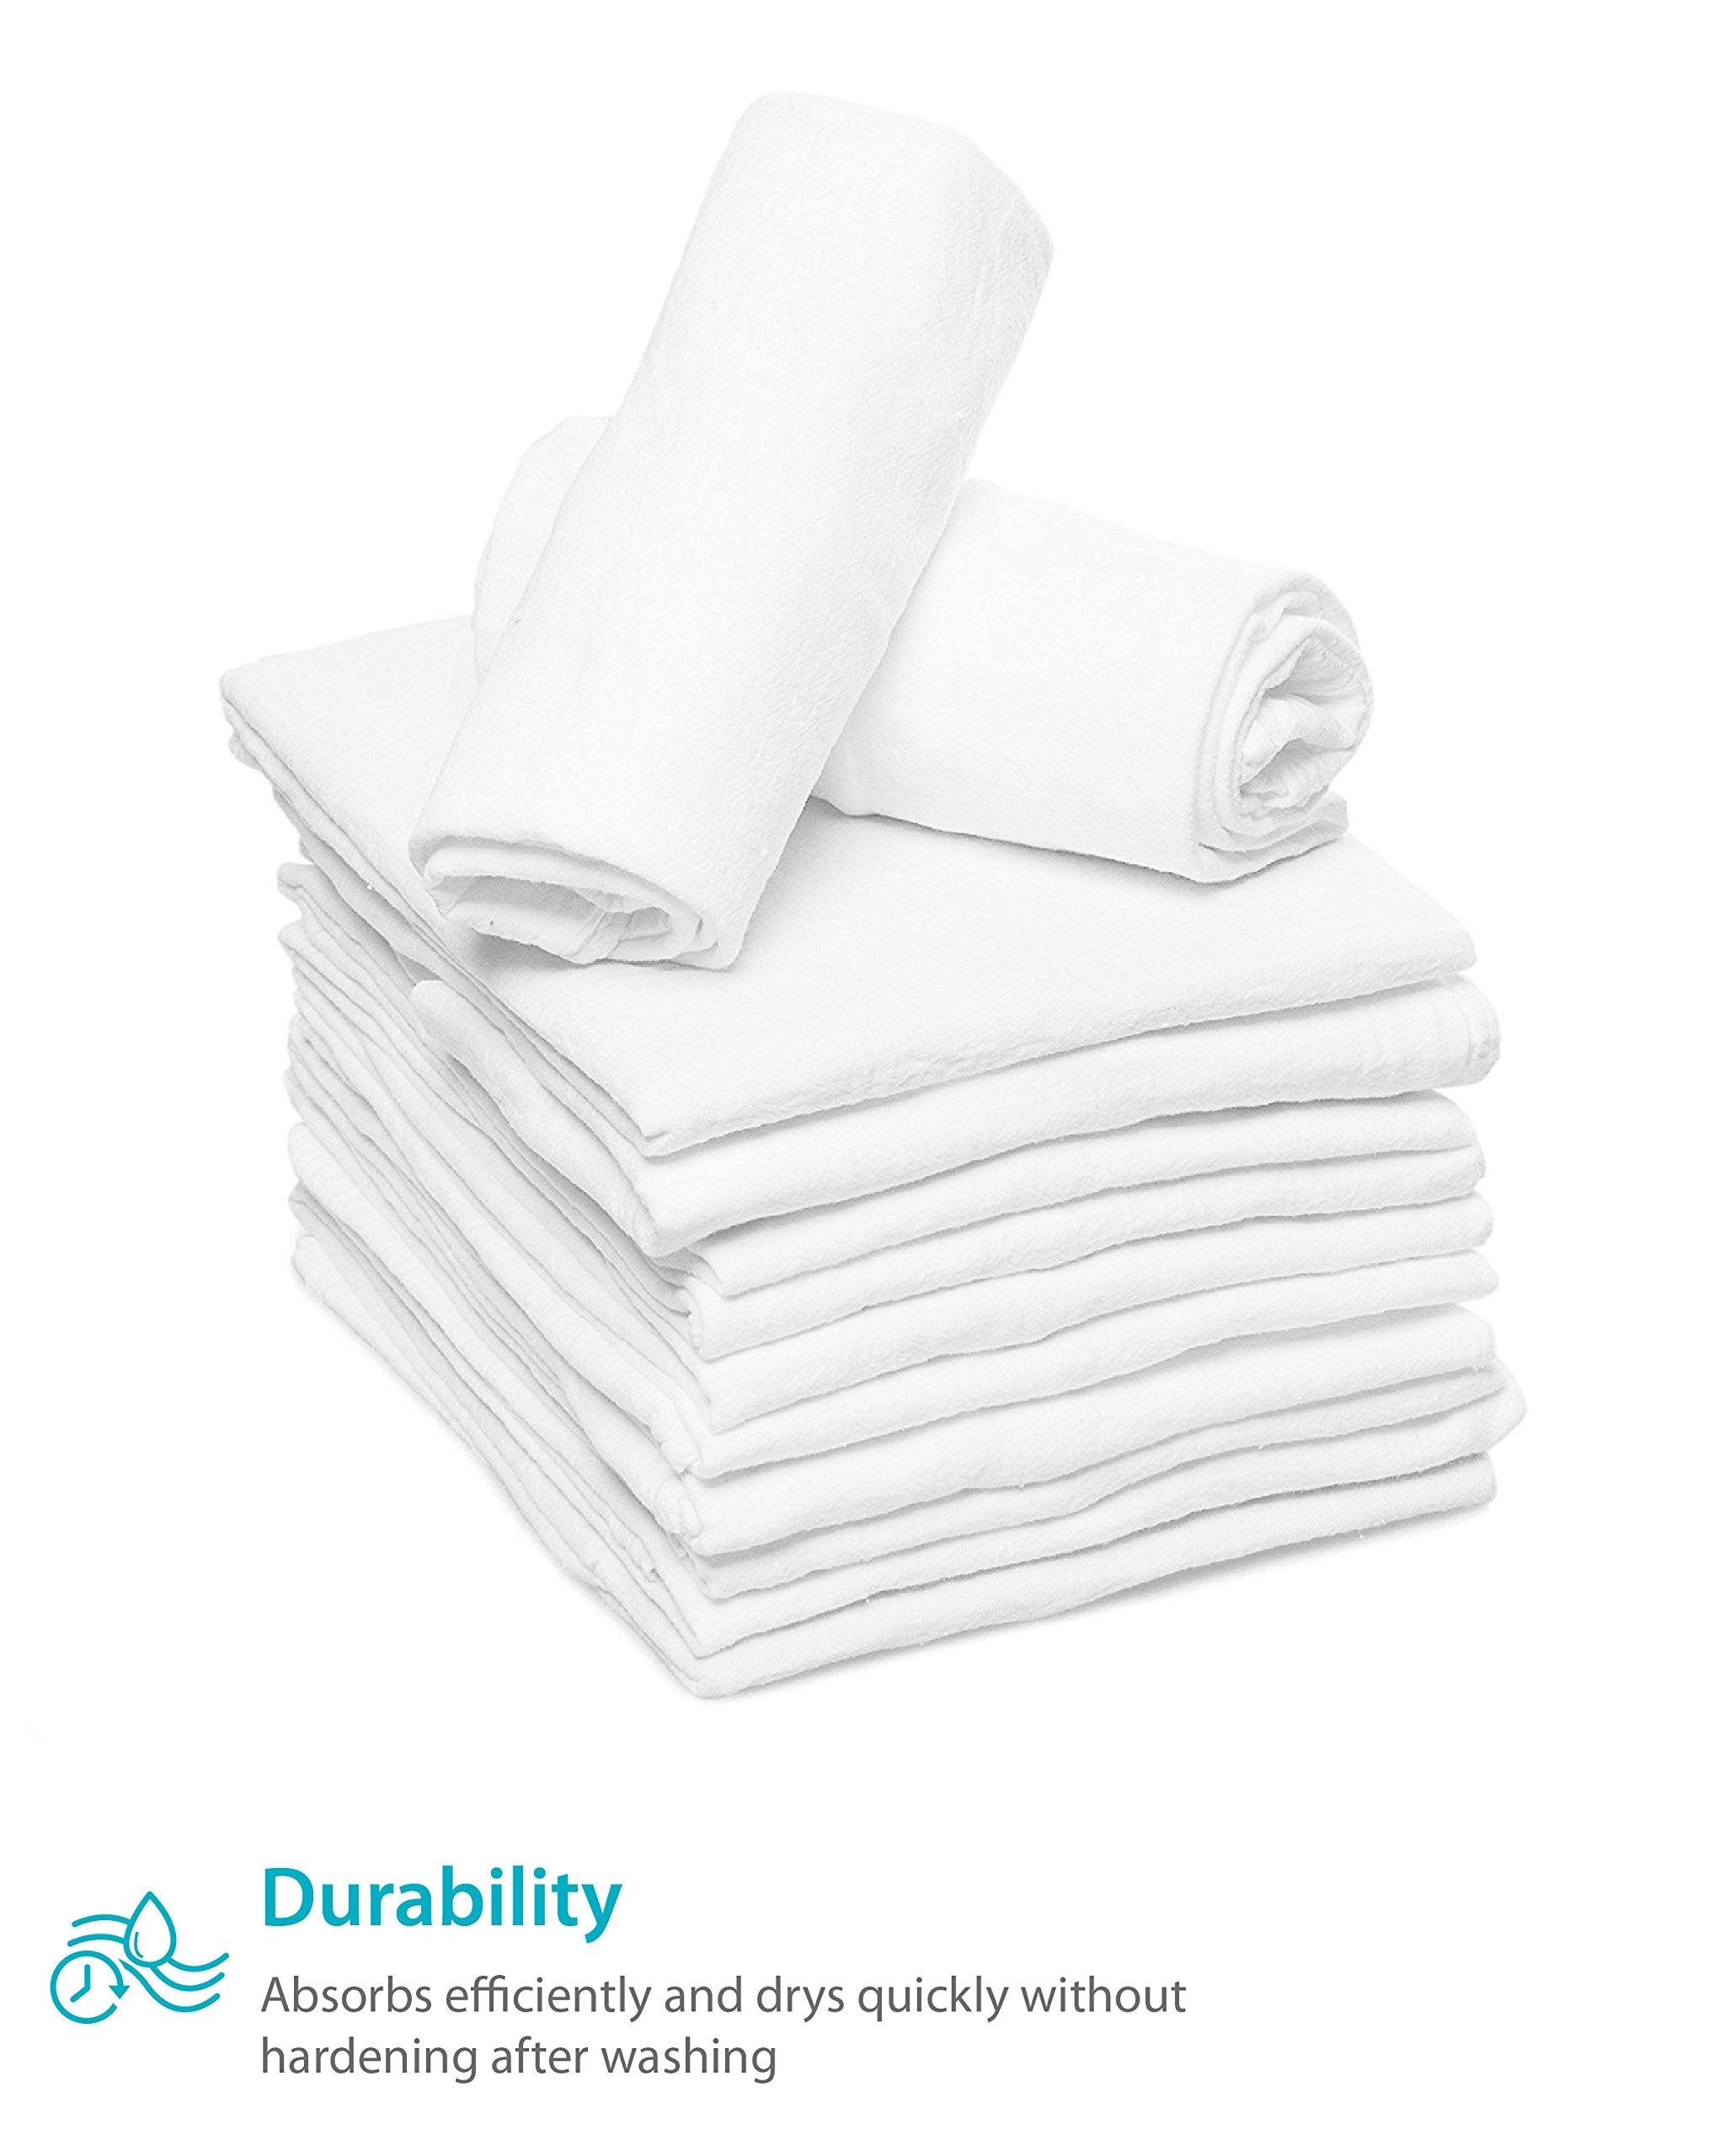 Zeppoli 12-Pack Flour Sack Towels - 31'' x 31'' Kitchen Towels - Absorbent White Dish Towels - 100% Ring Spun Cotton Bar Towels by Zeppoli (Image #7)